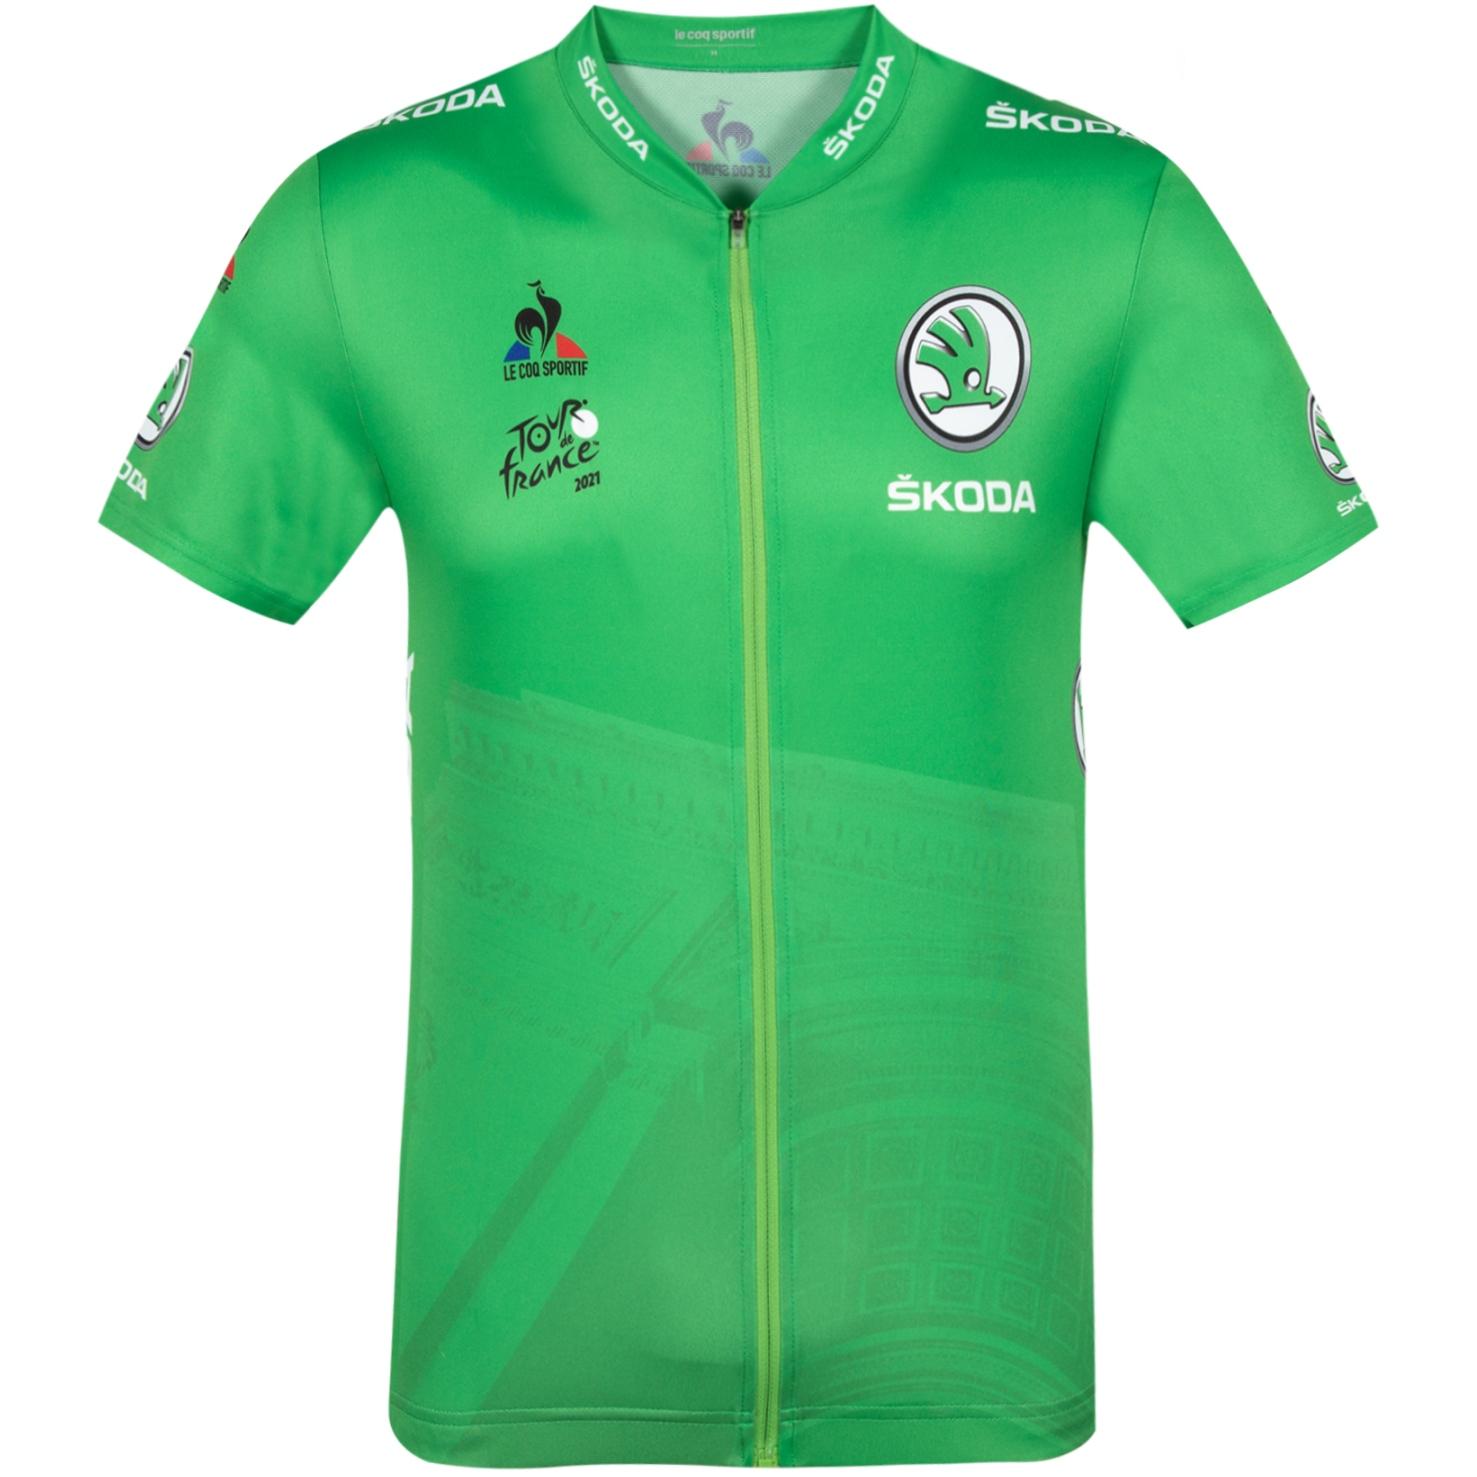 Le Coq Sportif Tour de France™ 2021 Collection Replica Kurzarm-Trikot - Grün